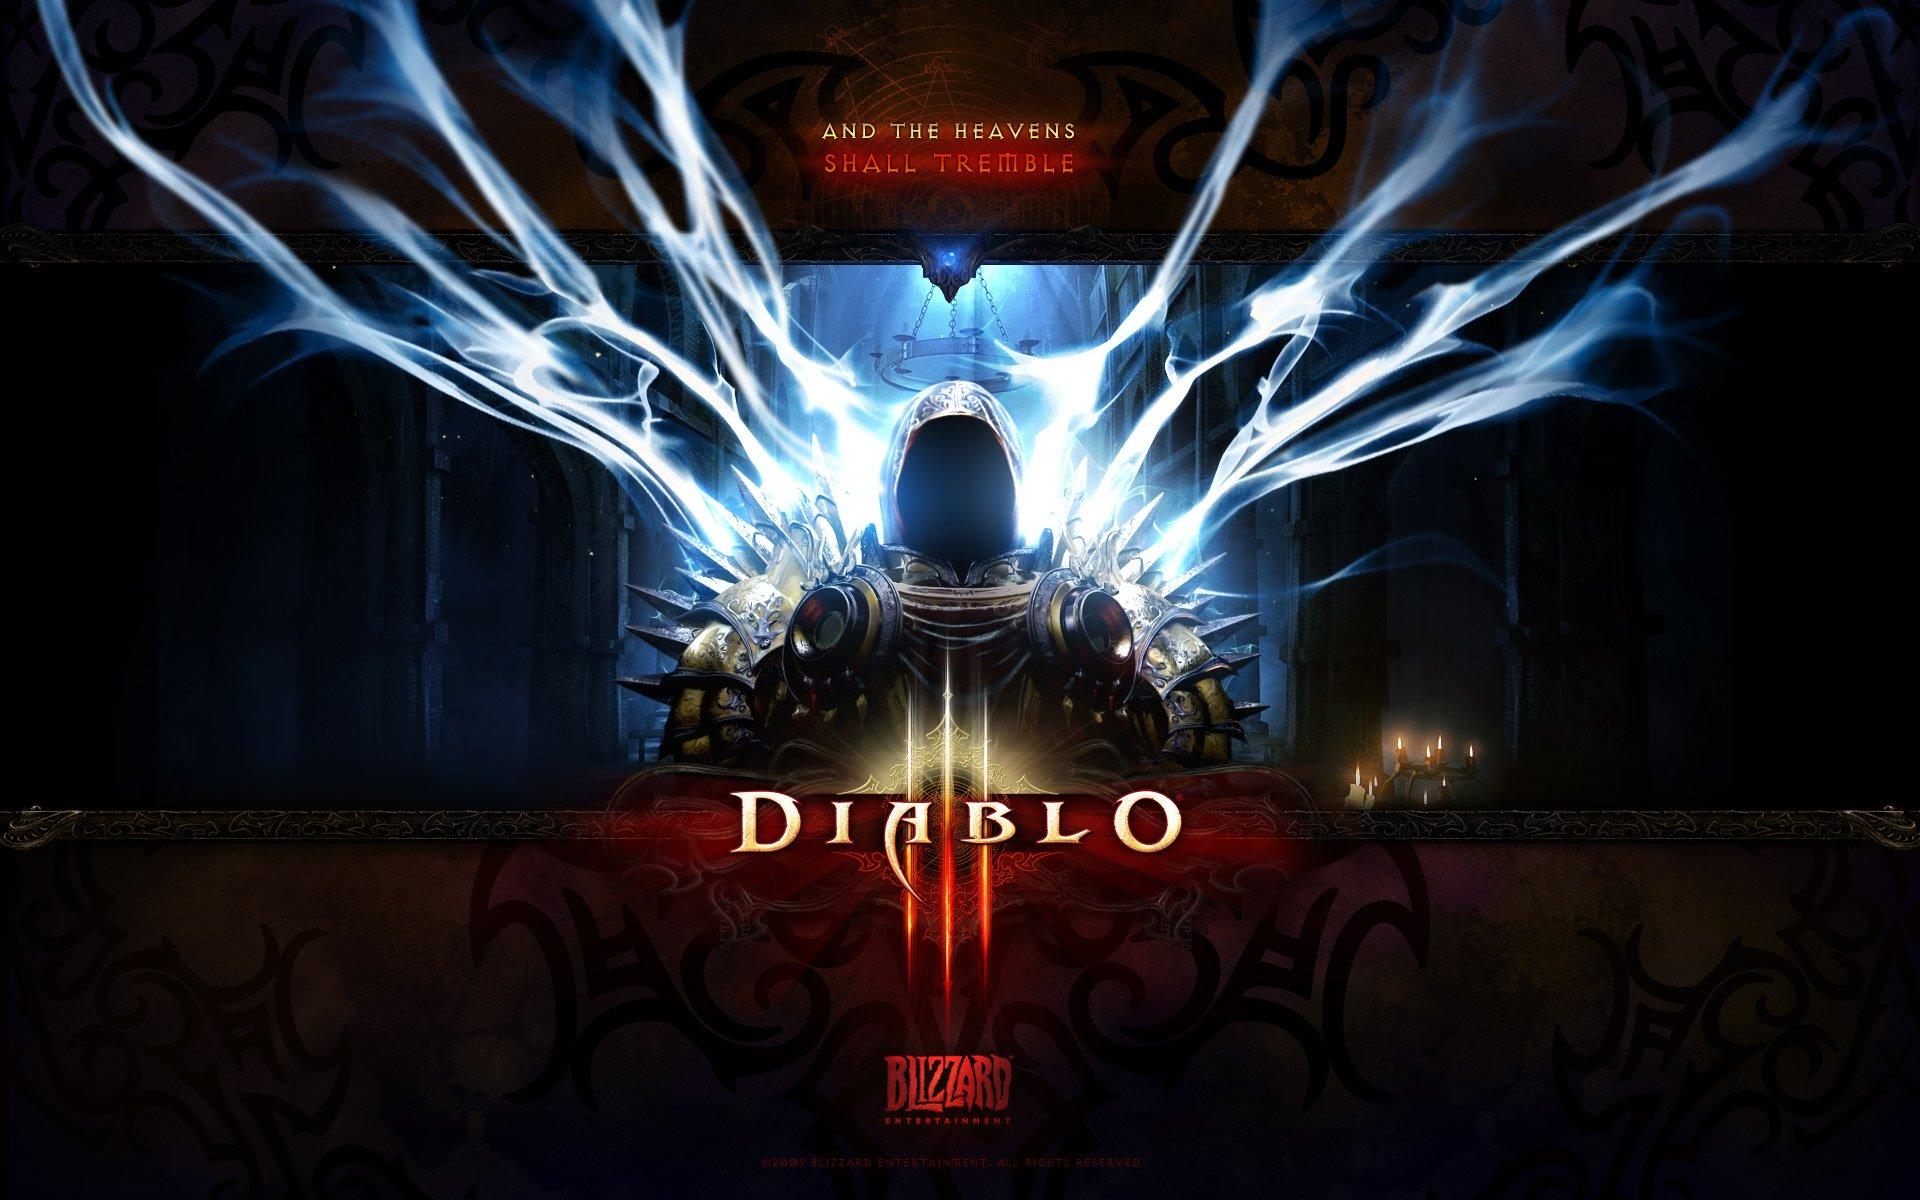 Diablo 3 wallpaper 3